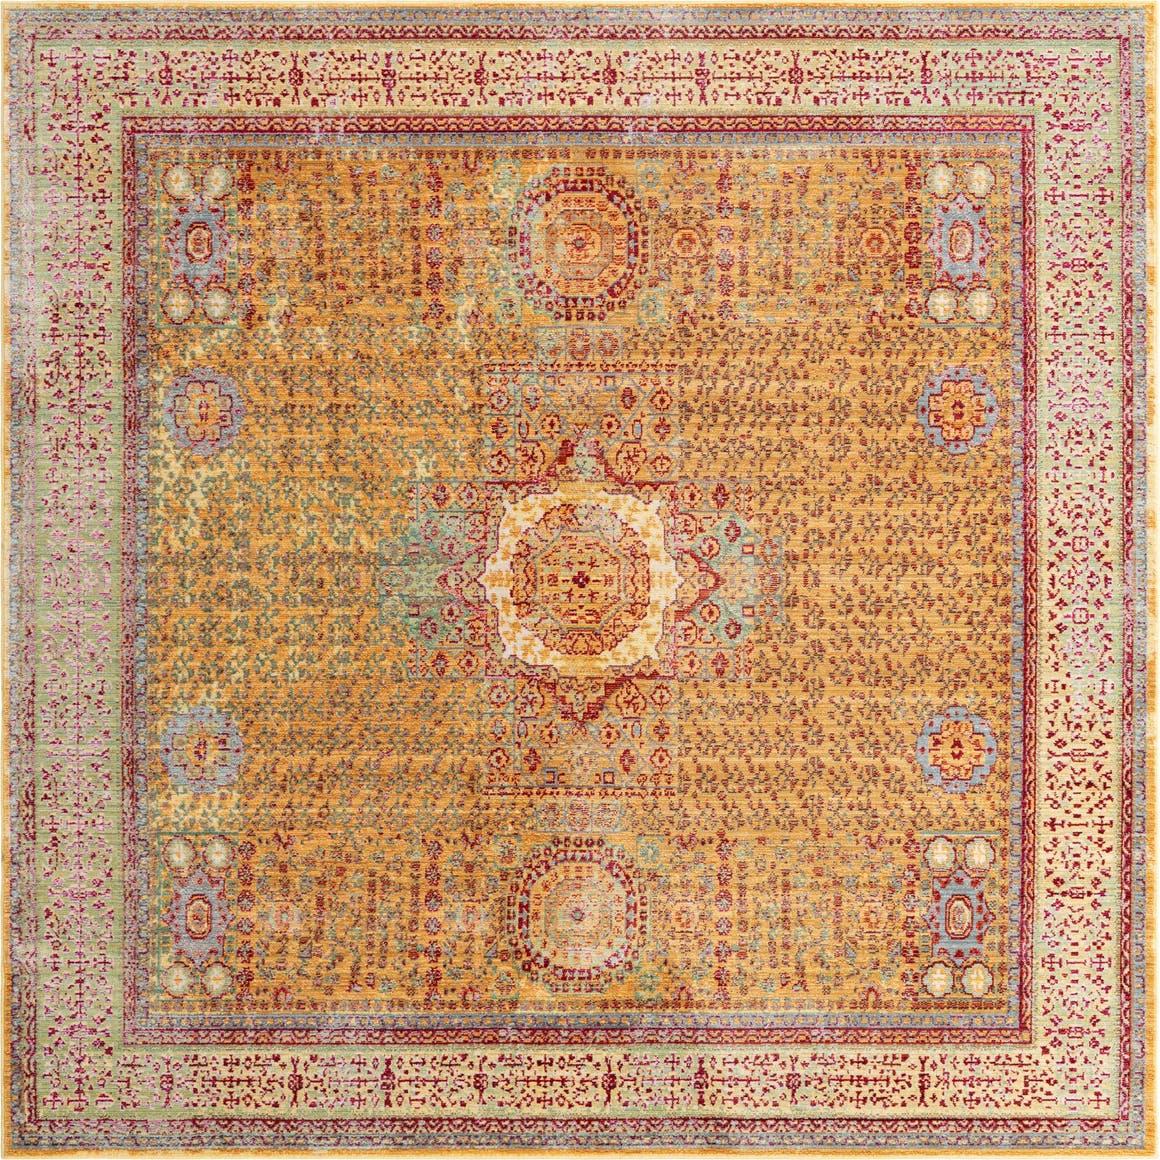 8' x 8' Aqua Square Rug main image